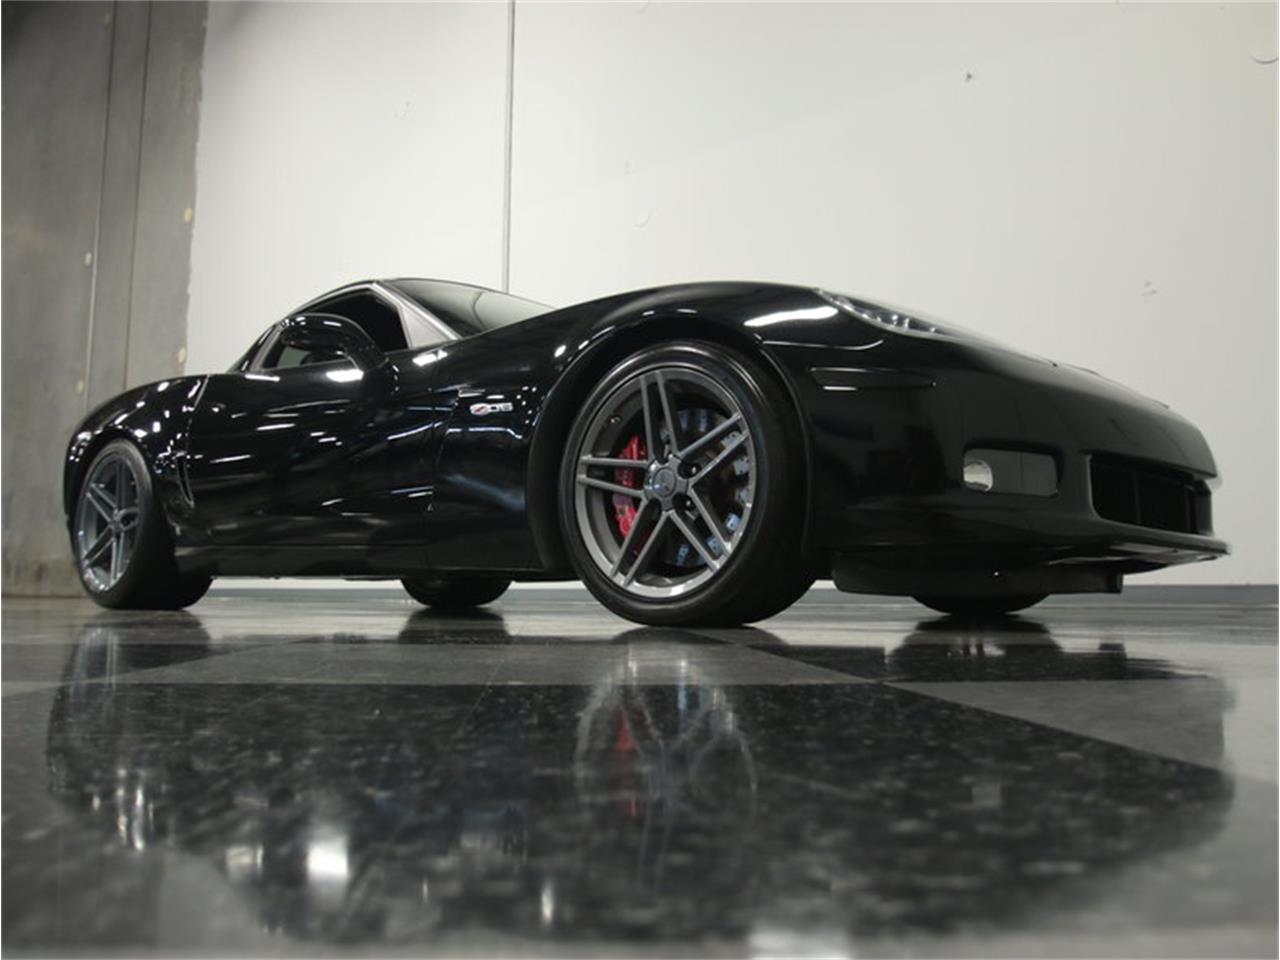 Large Picture of '08 Corvette Z06 located in Georgia - $39,995.00 - J8VS